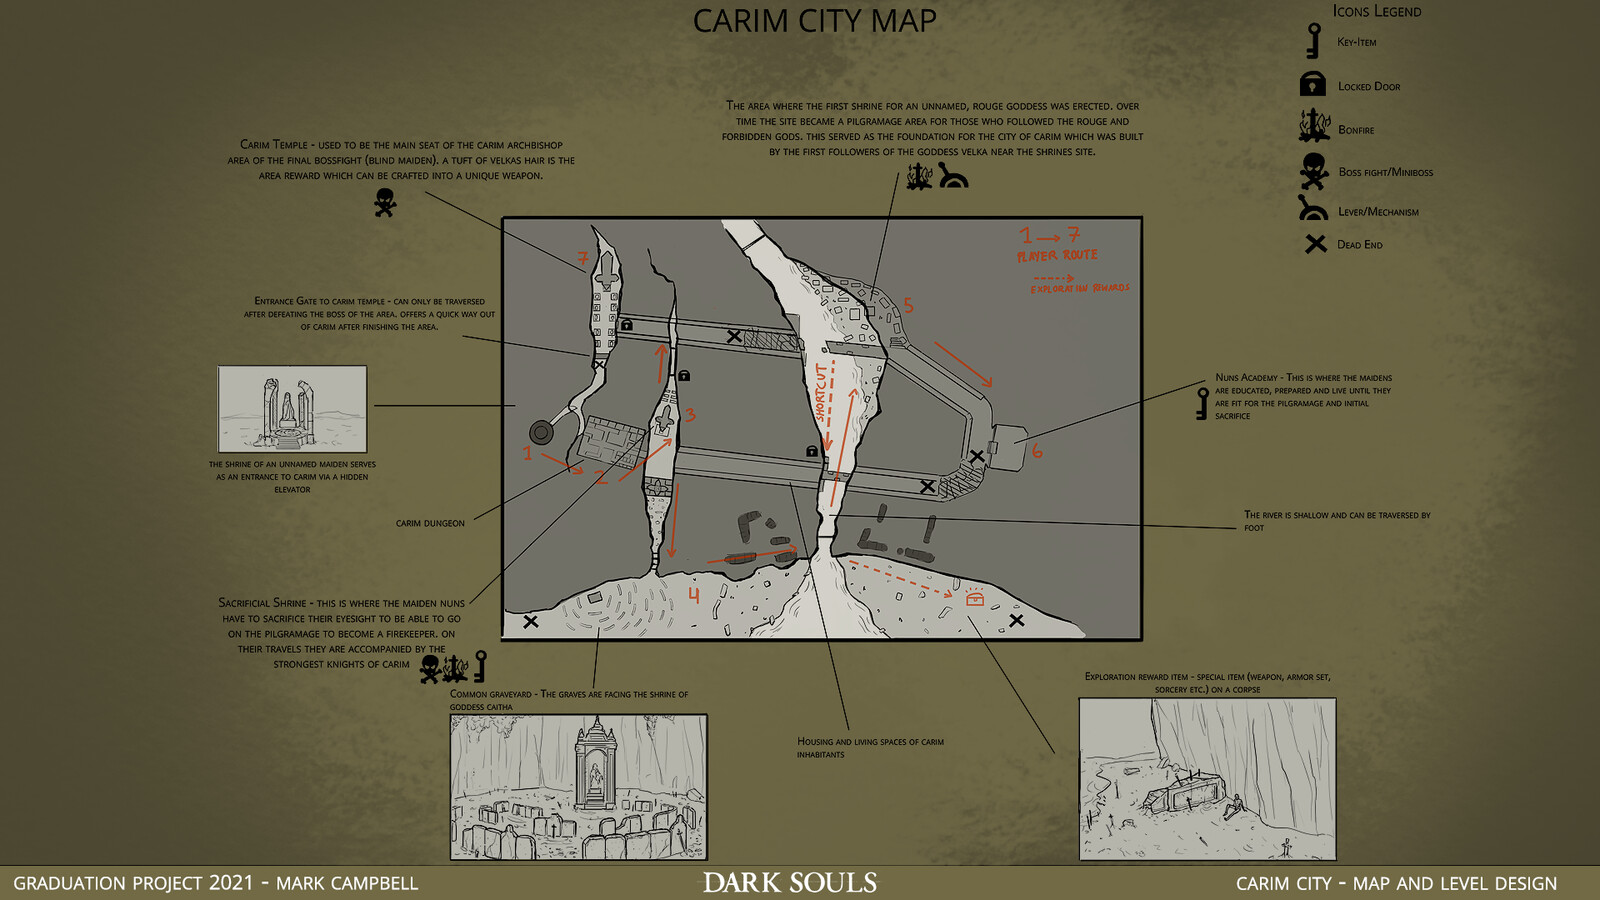 Carim City Map overview